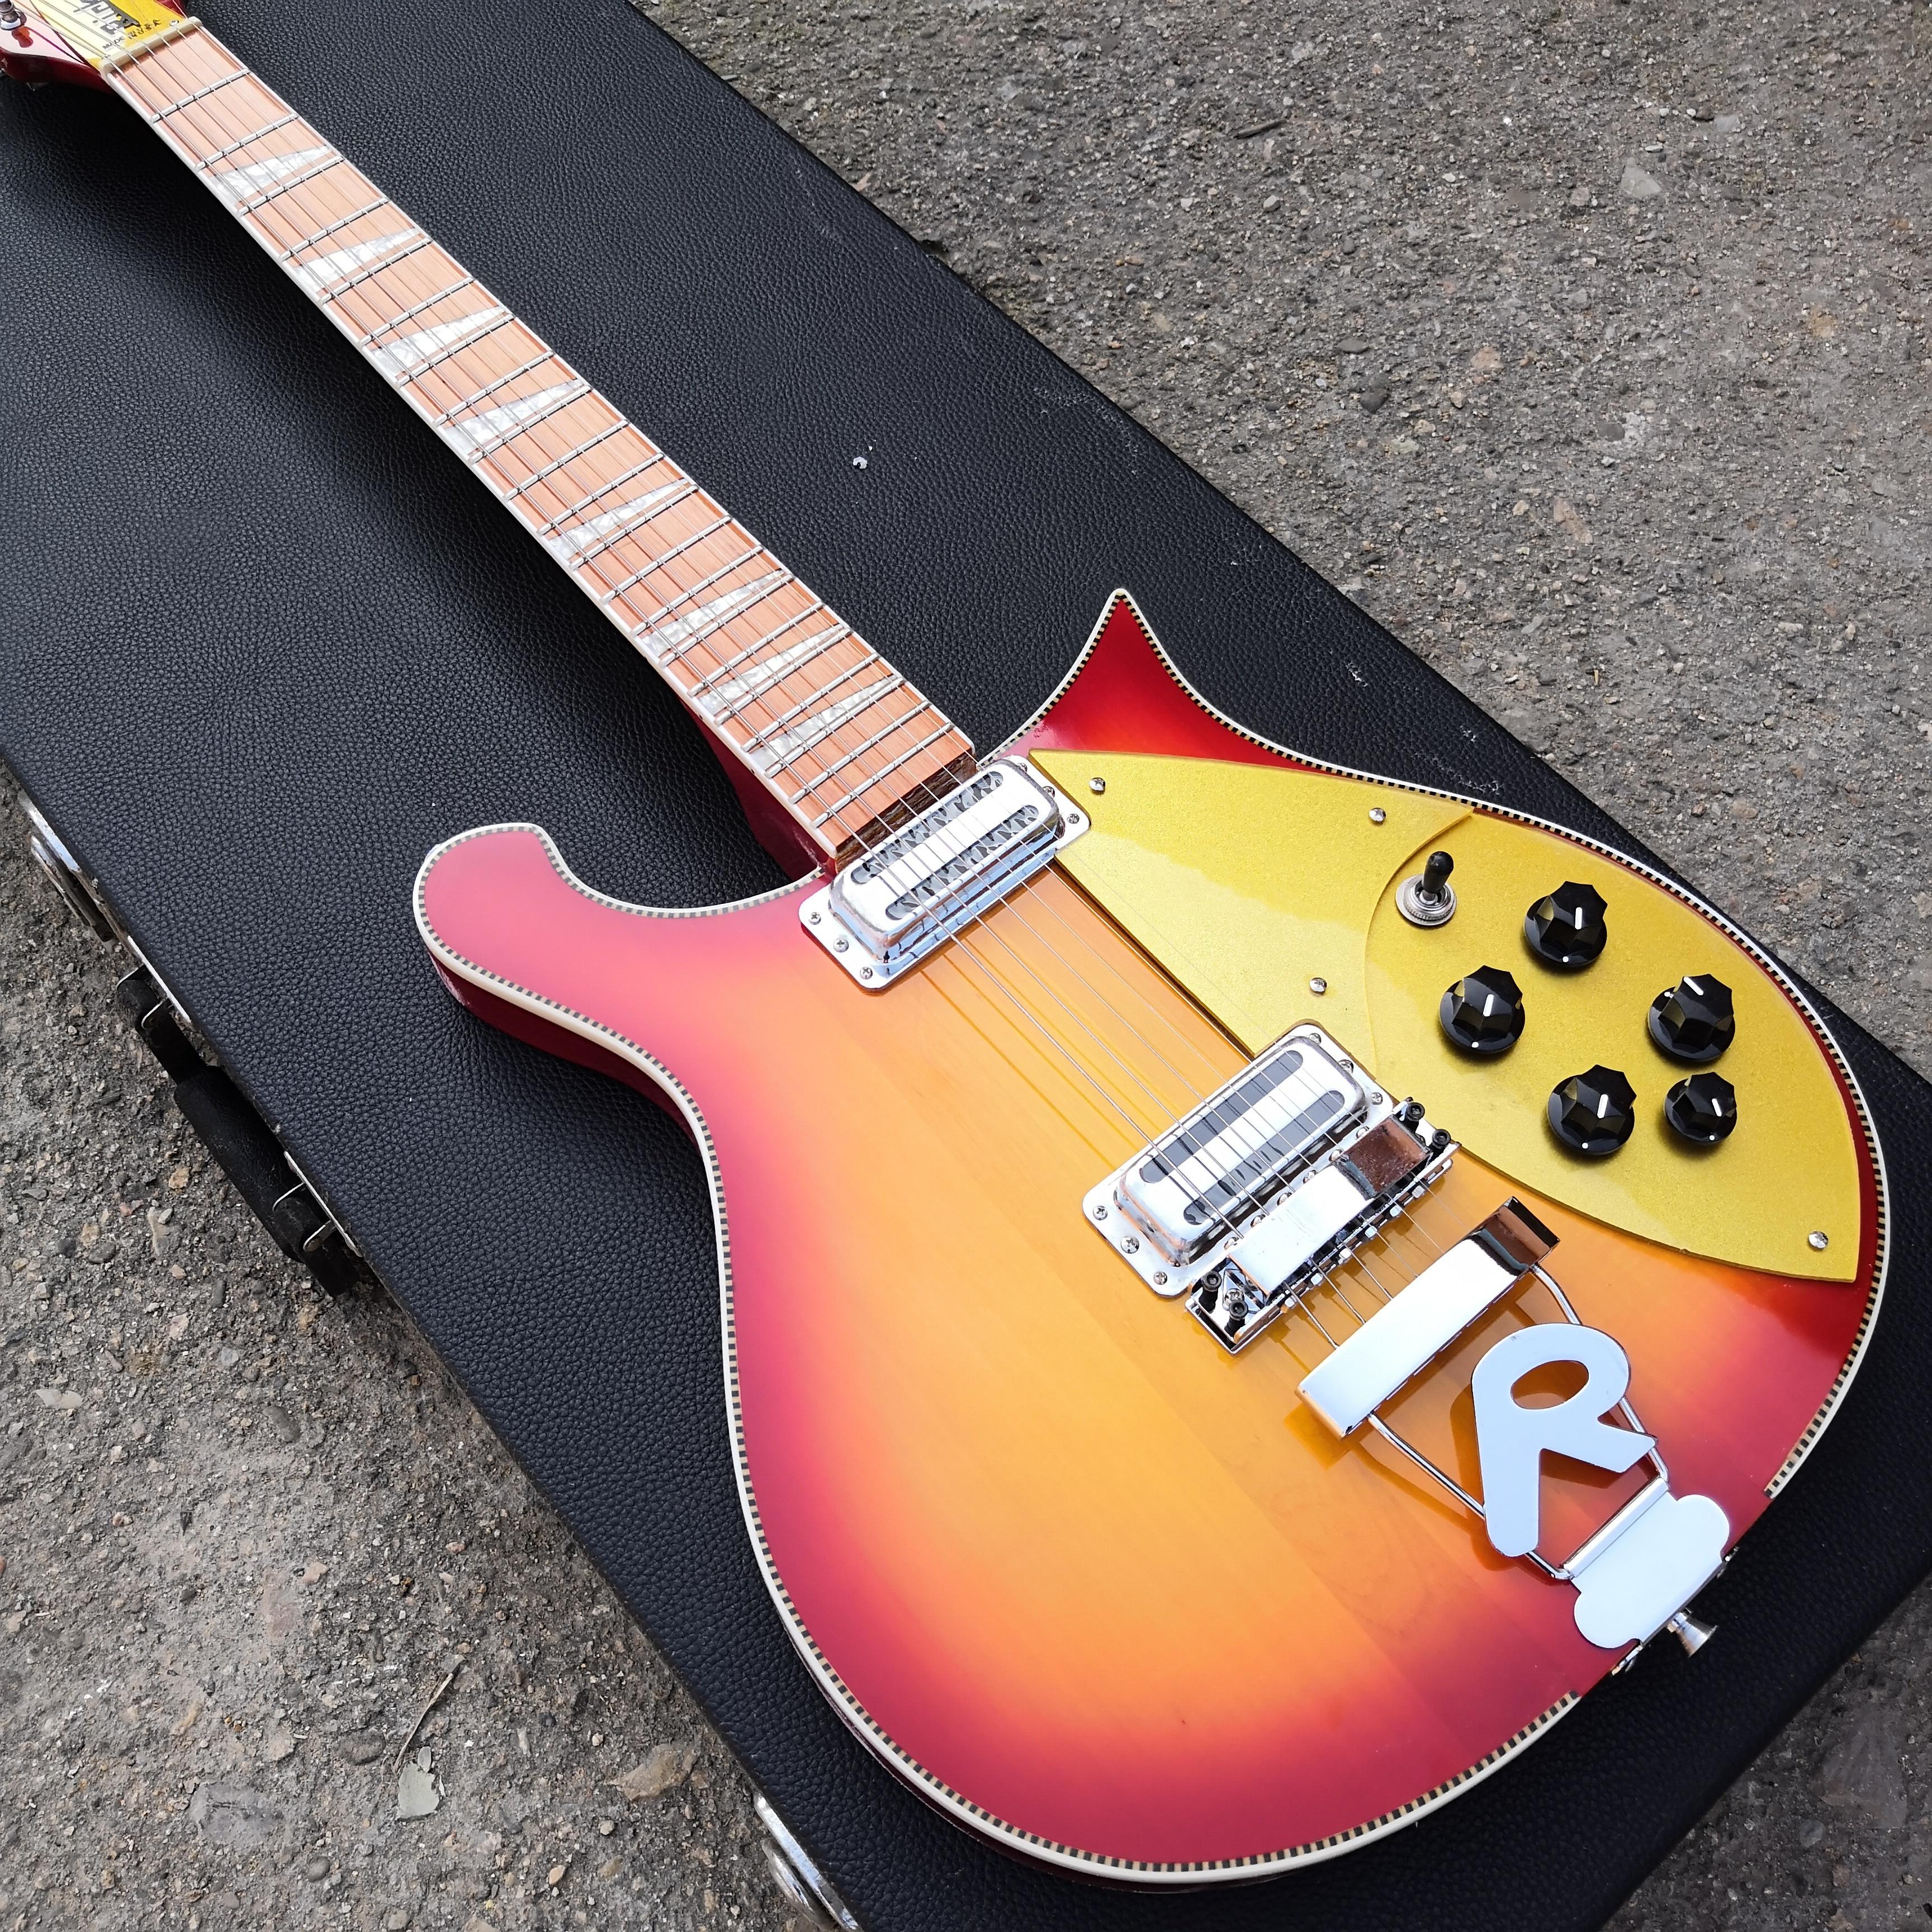 Guitarra Eléctrica R-6/12 de 660 cuerdas, diapasón de palisandro barniz brillante 5 grados